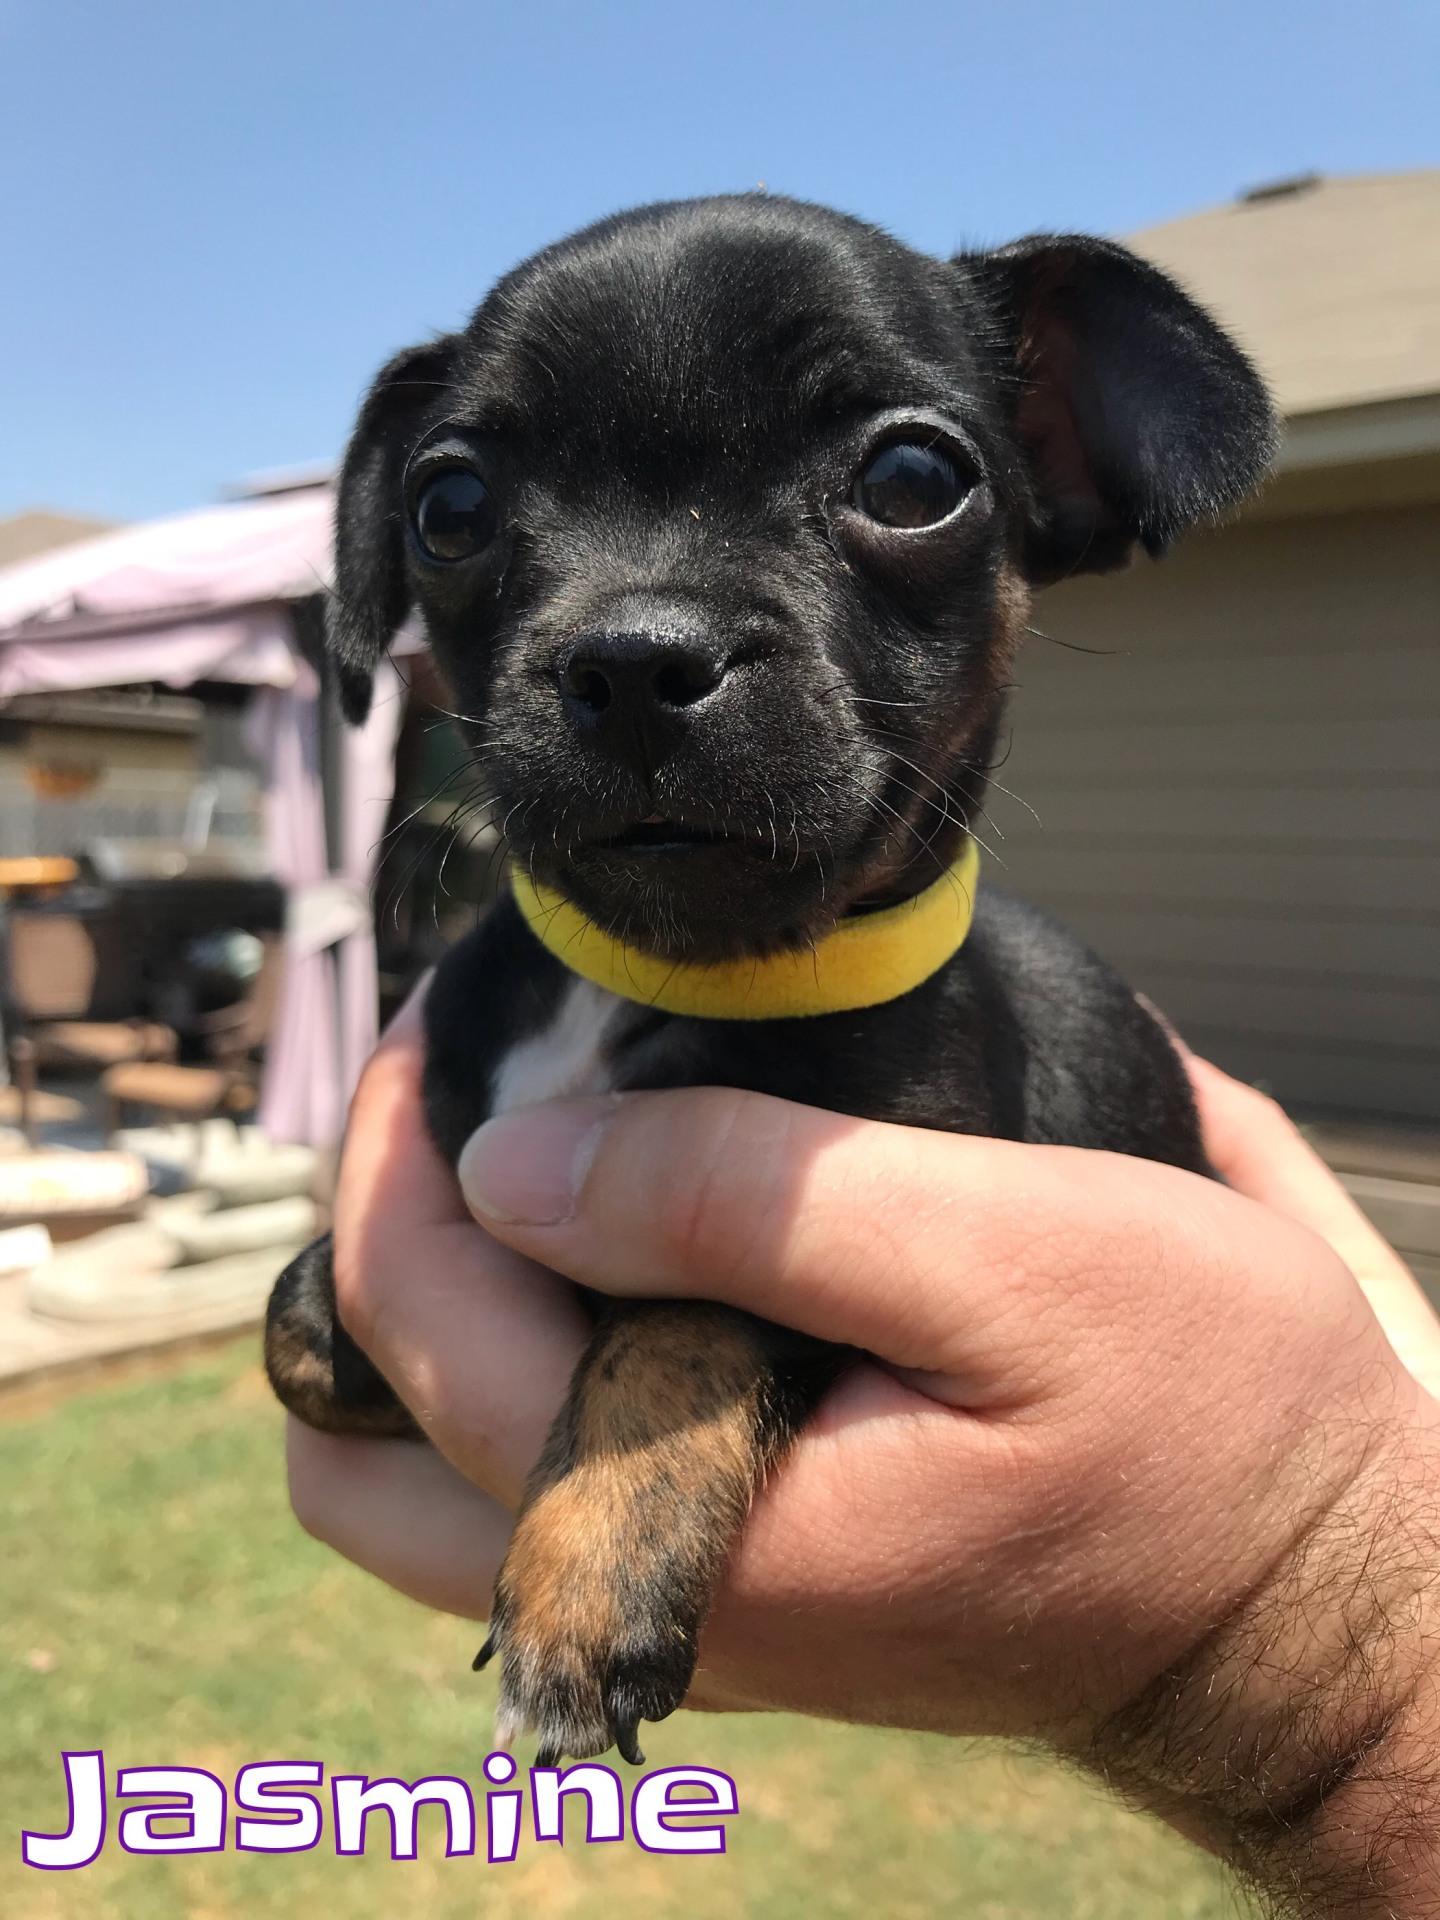 Jasmine - Adopted 10/10/2018